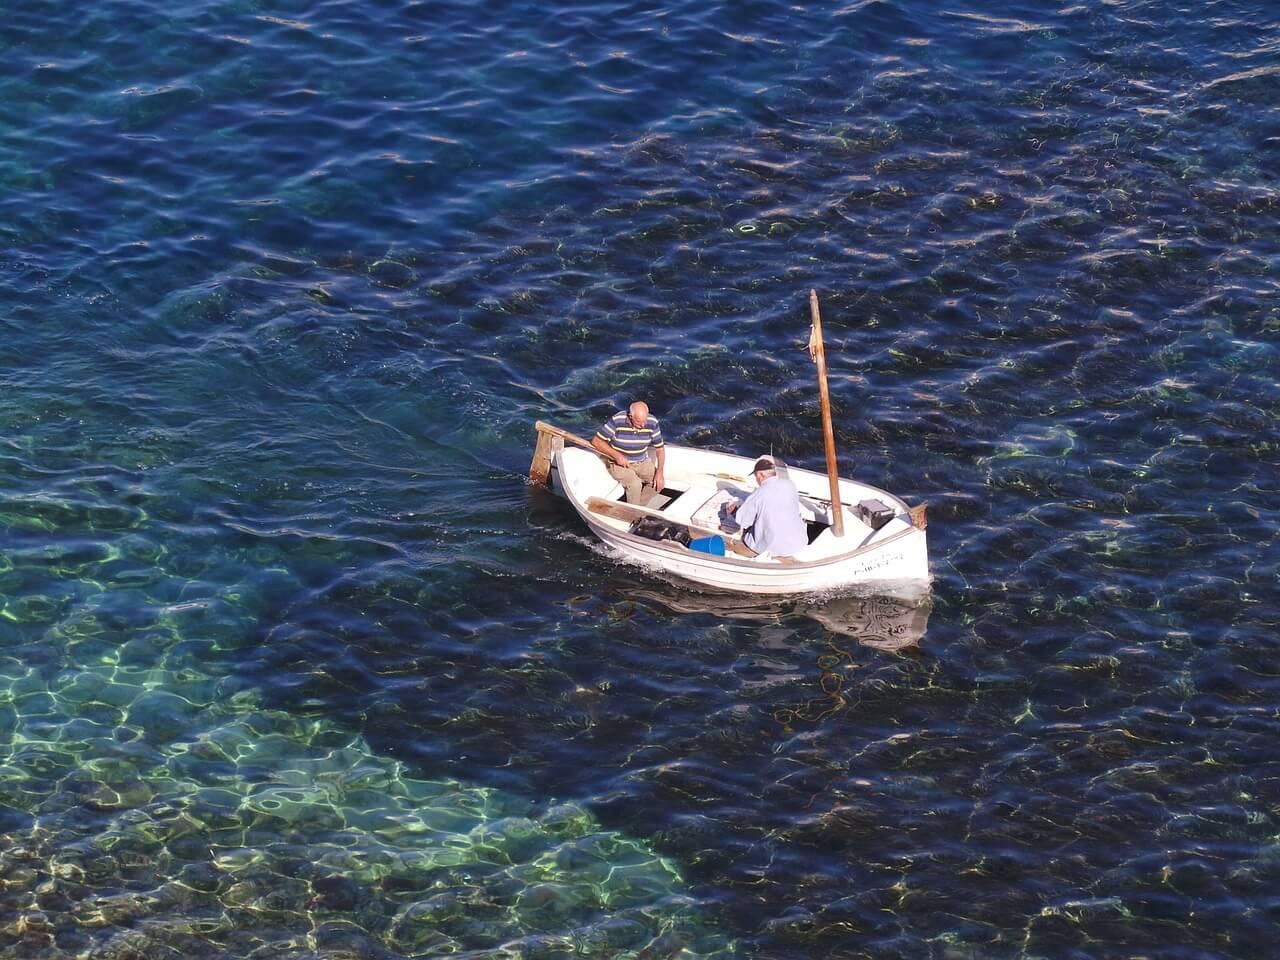 Mediterranean curiosities